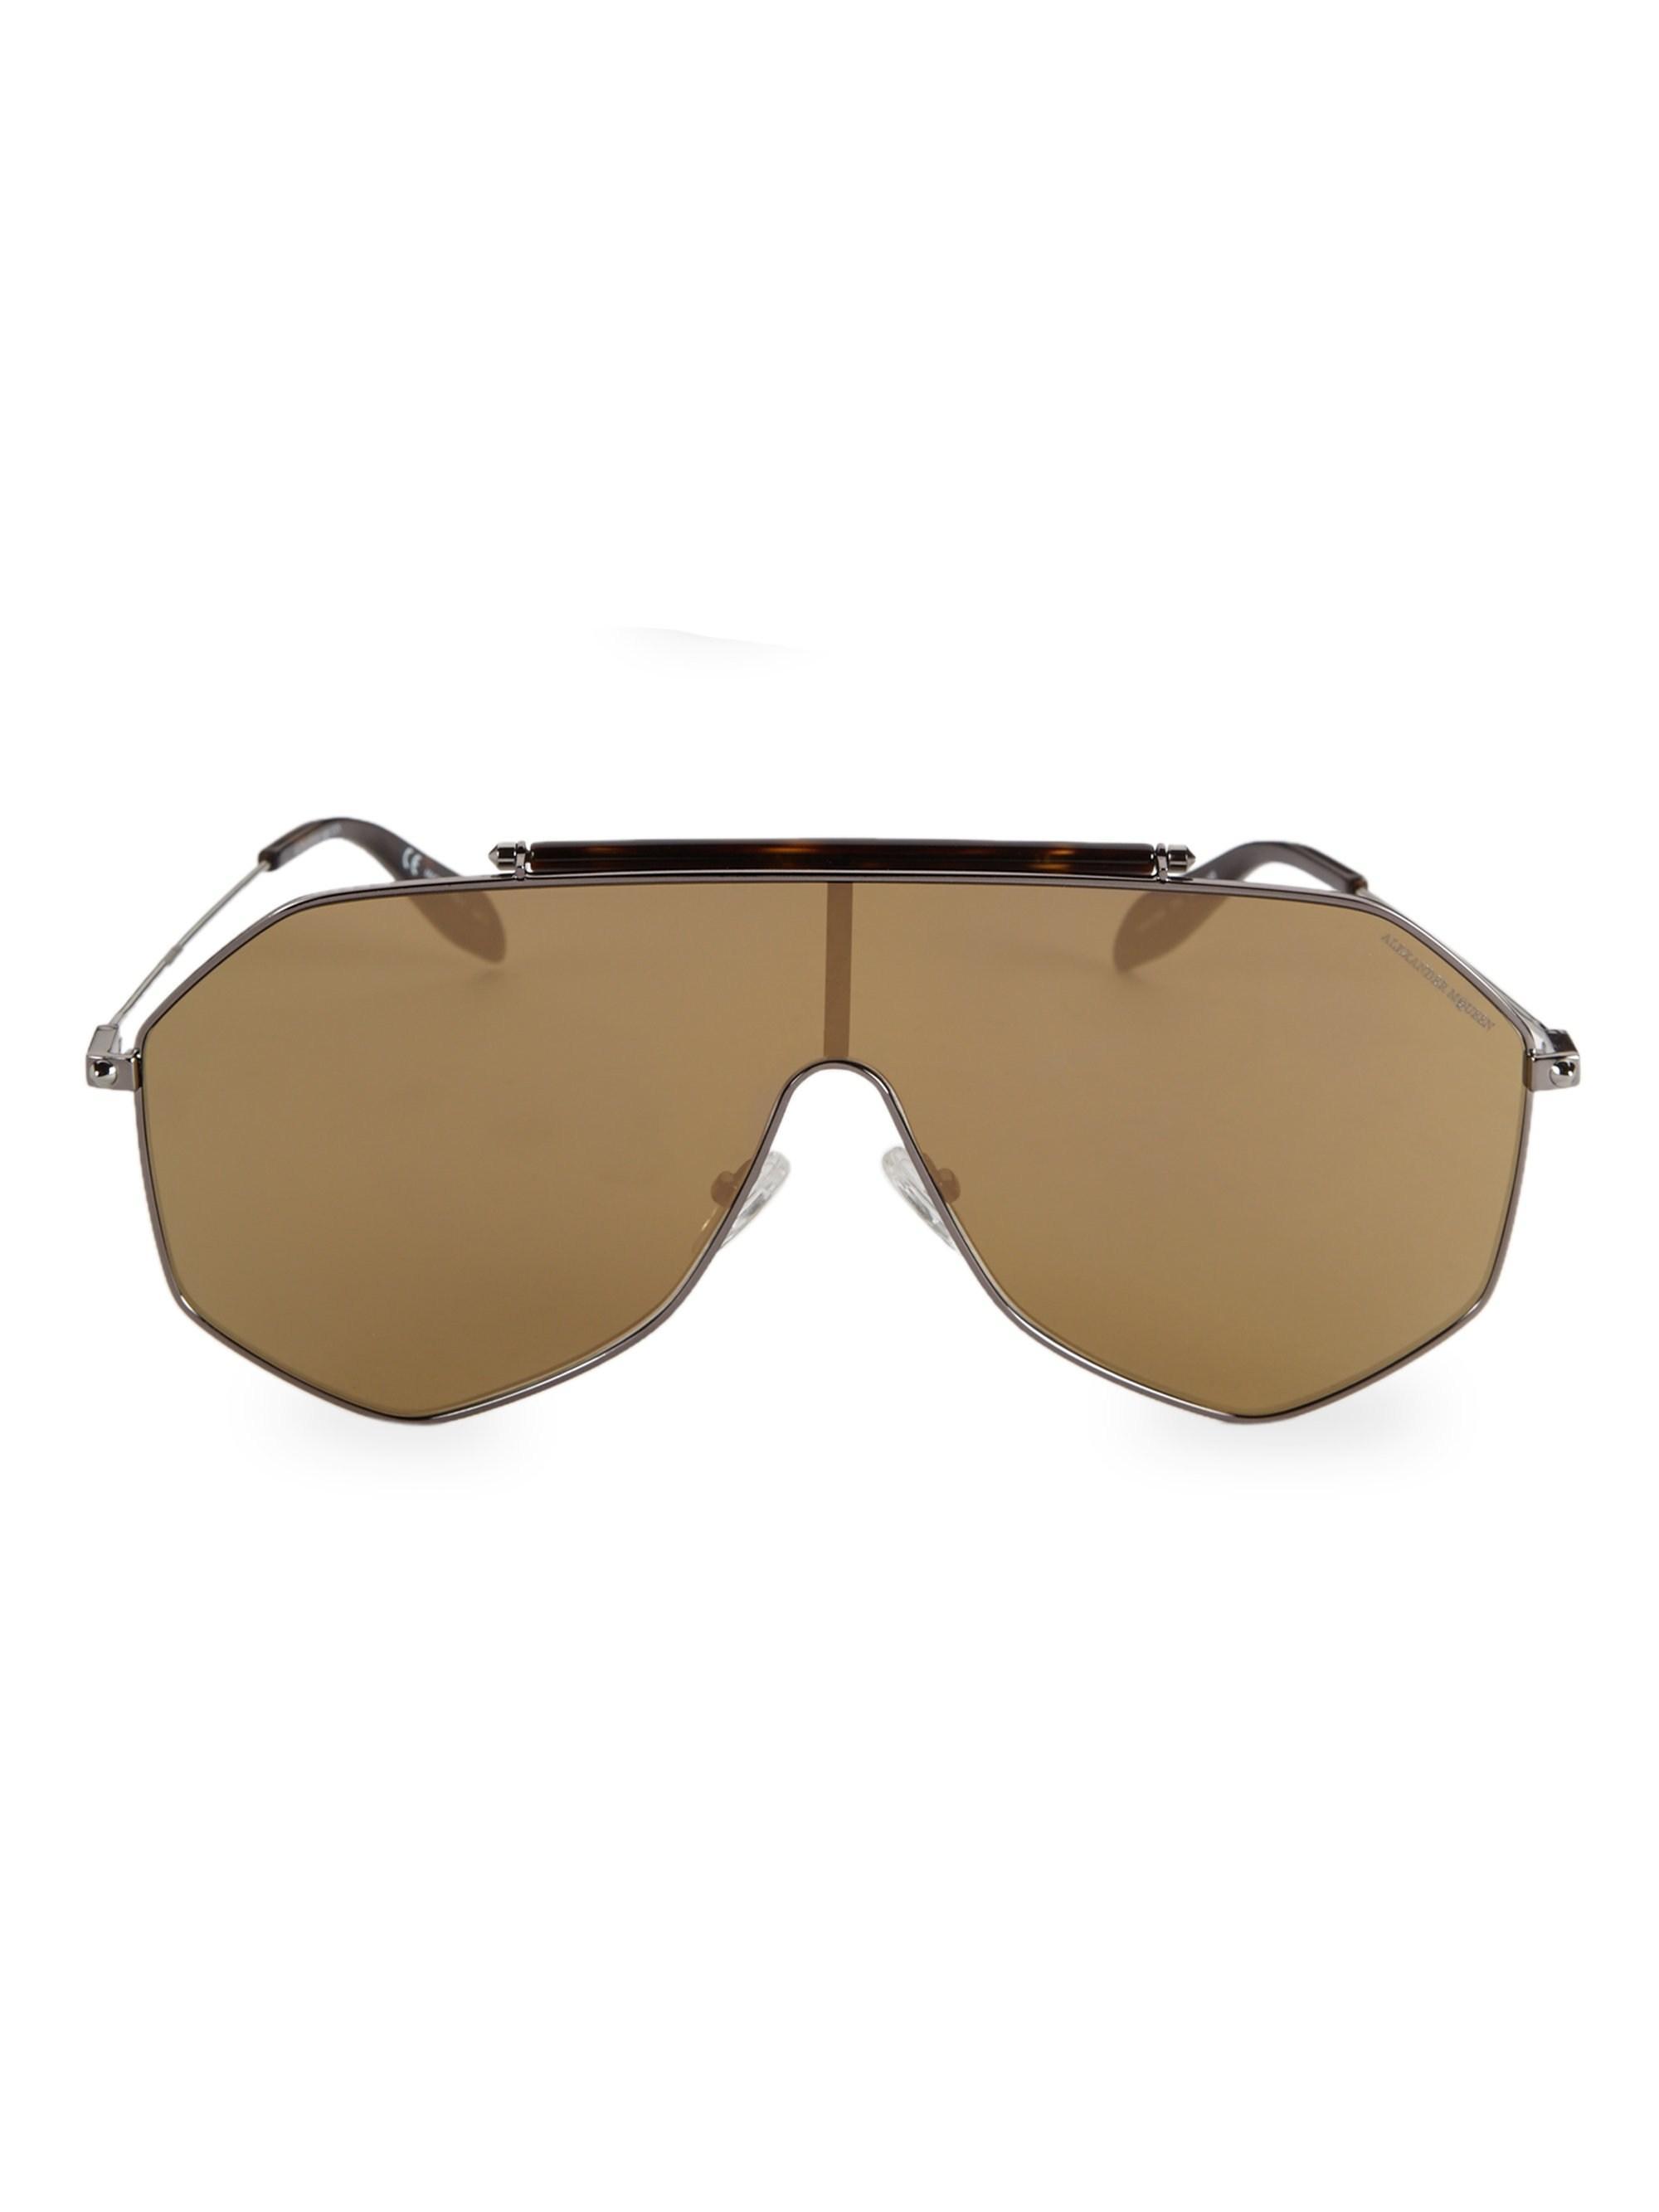 0cf3100a96c0 Lyst - Alexander McQueen Men s Piercing 99mm Shield Sunglasses ...